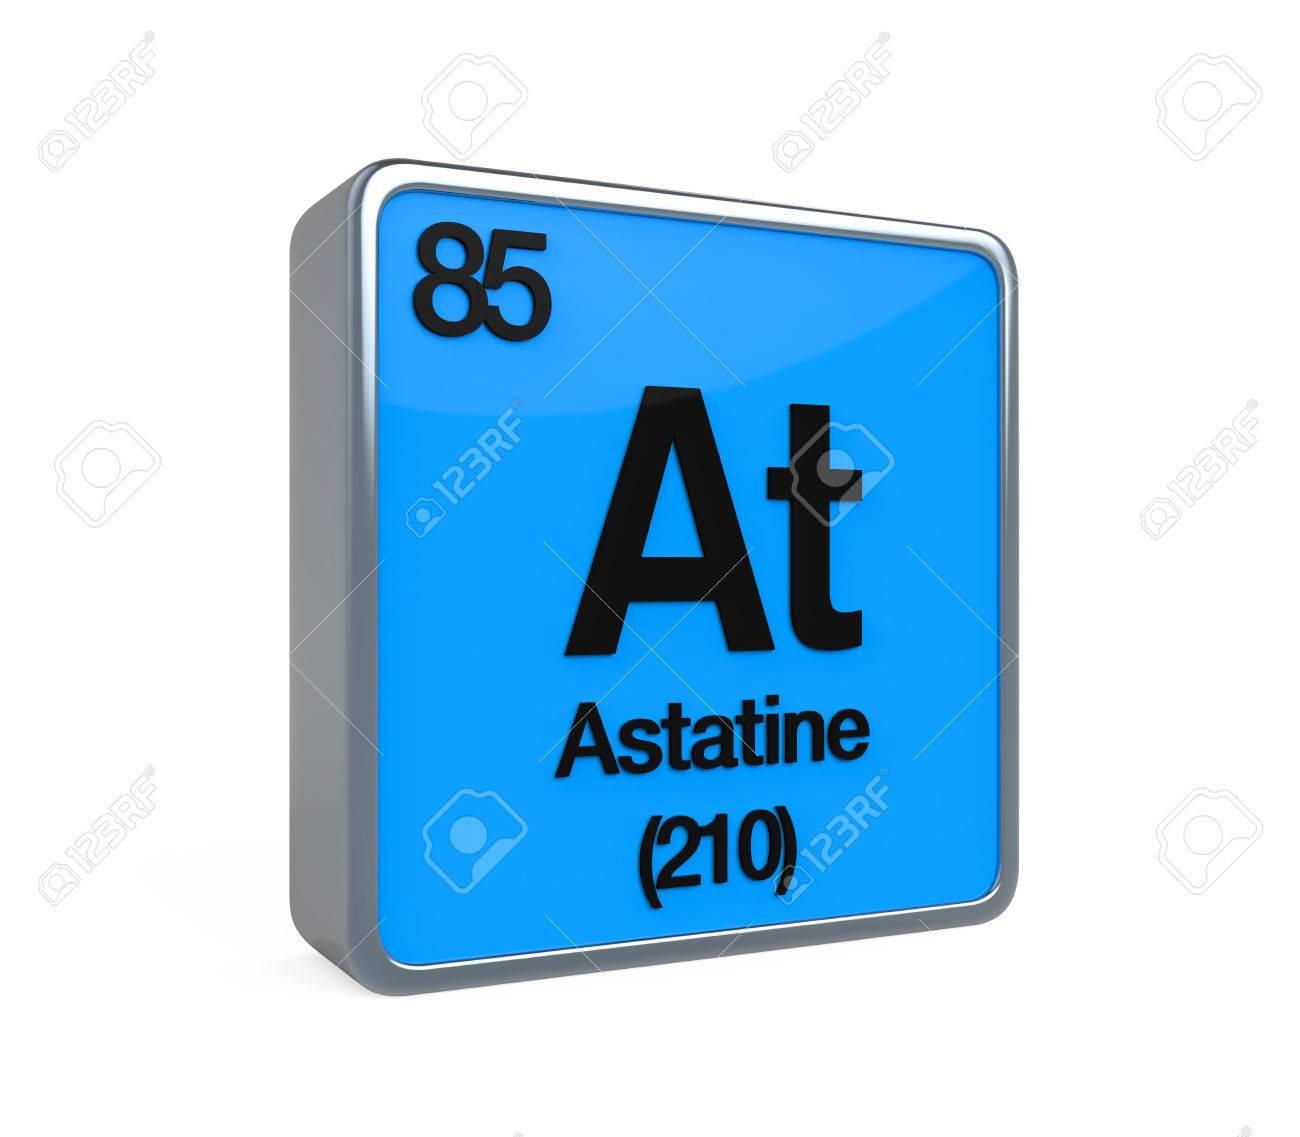 Astatine element periodic table stock photo picture and royalty astatine element periodic table stock photo 32898036 gamestrikefo Image collections